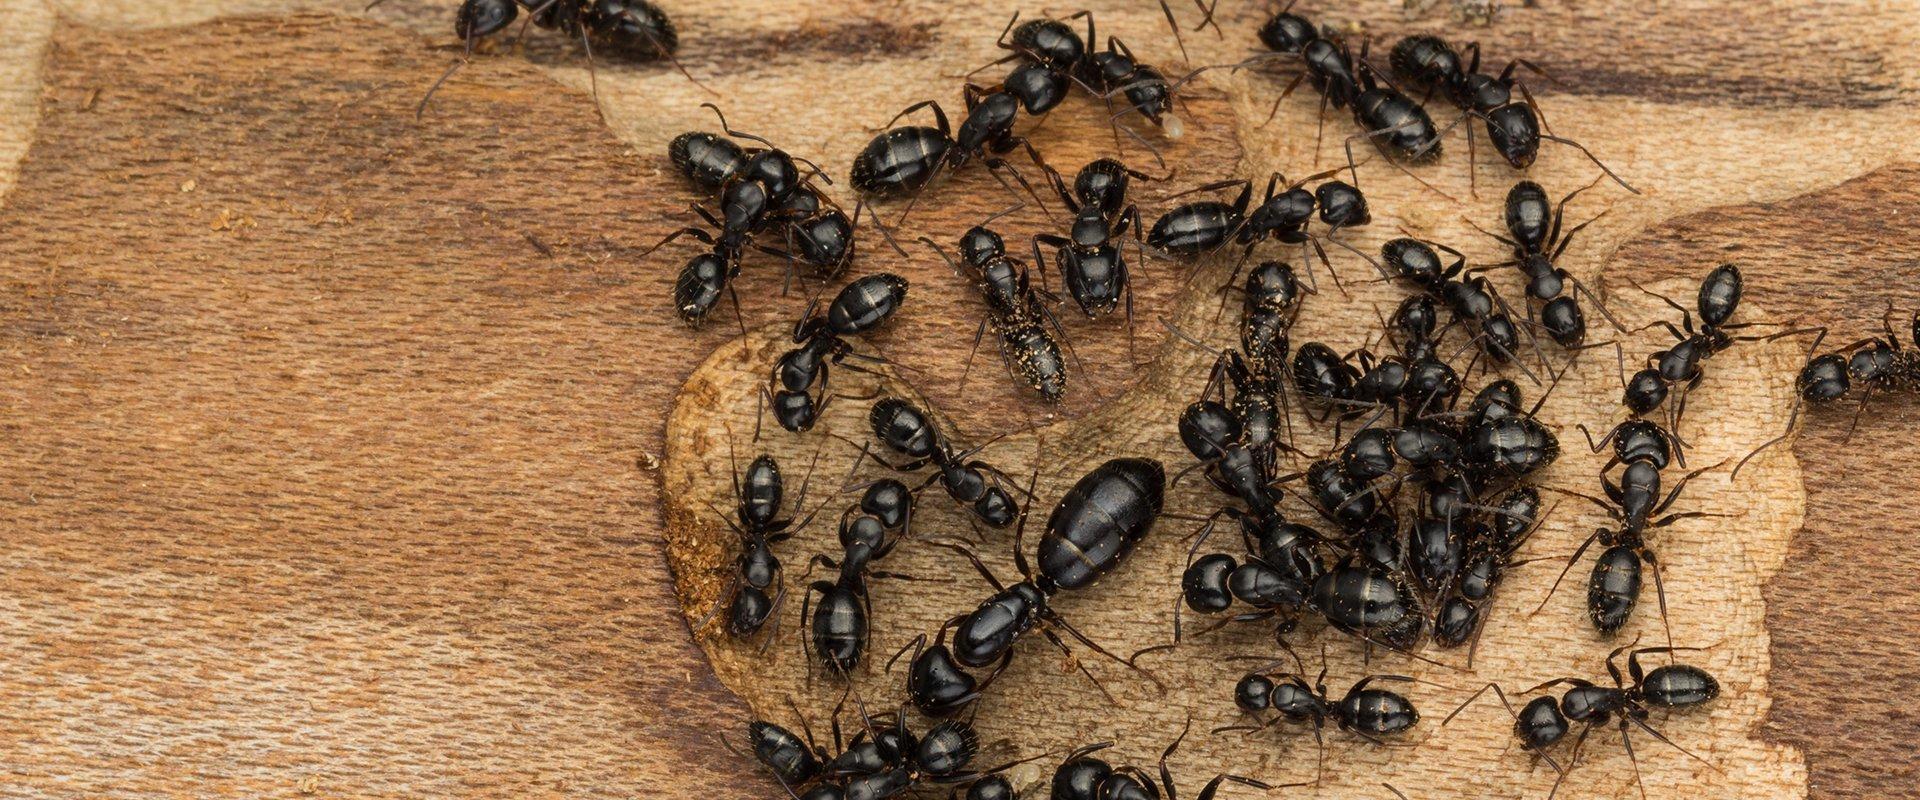 carpenter ants